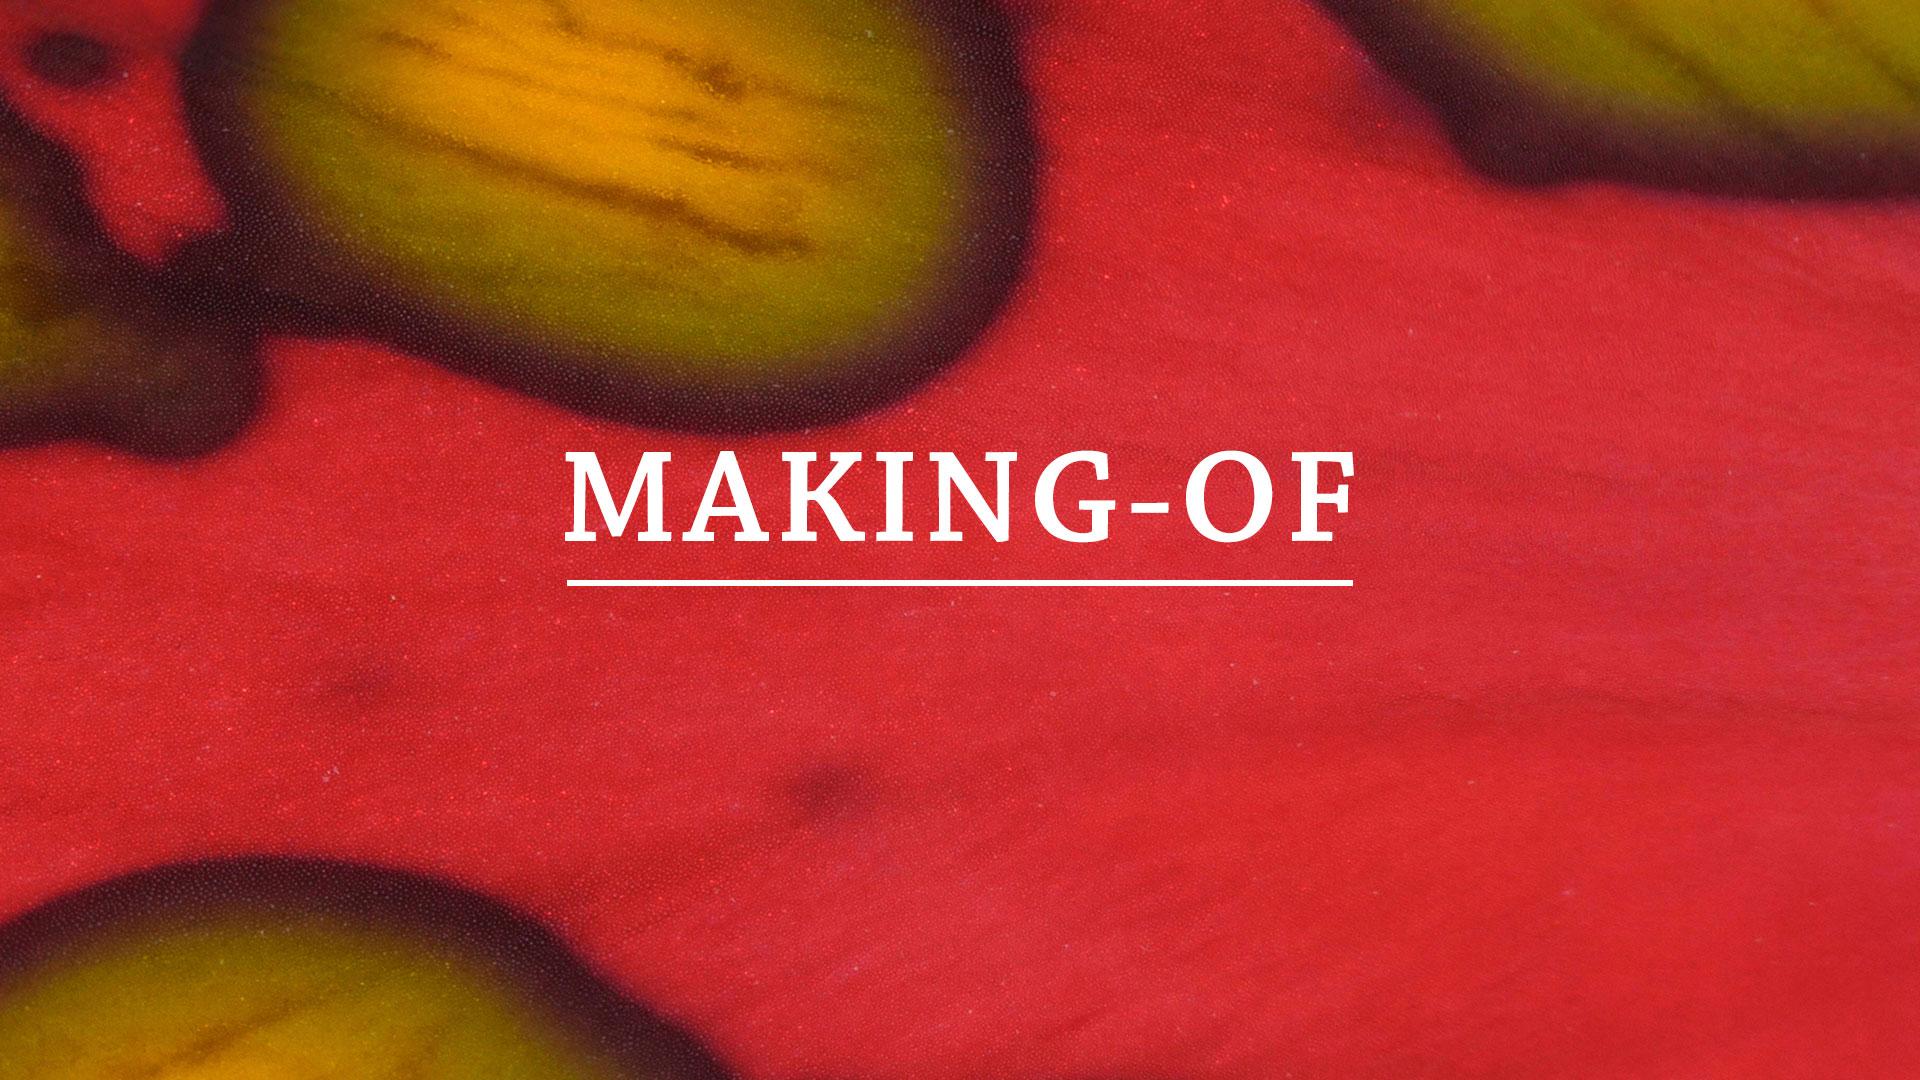 MAKING-OF.jpg